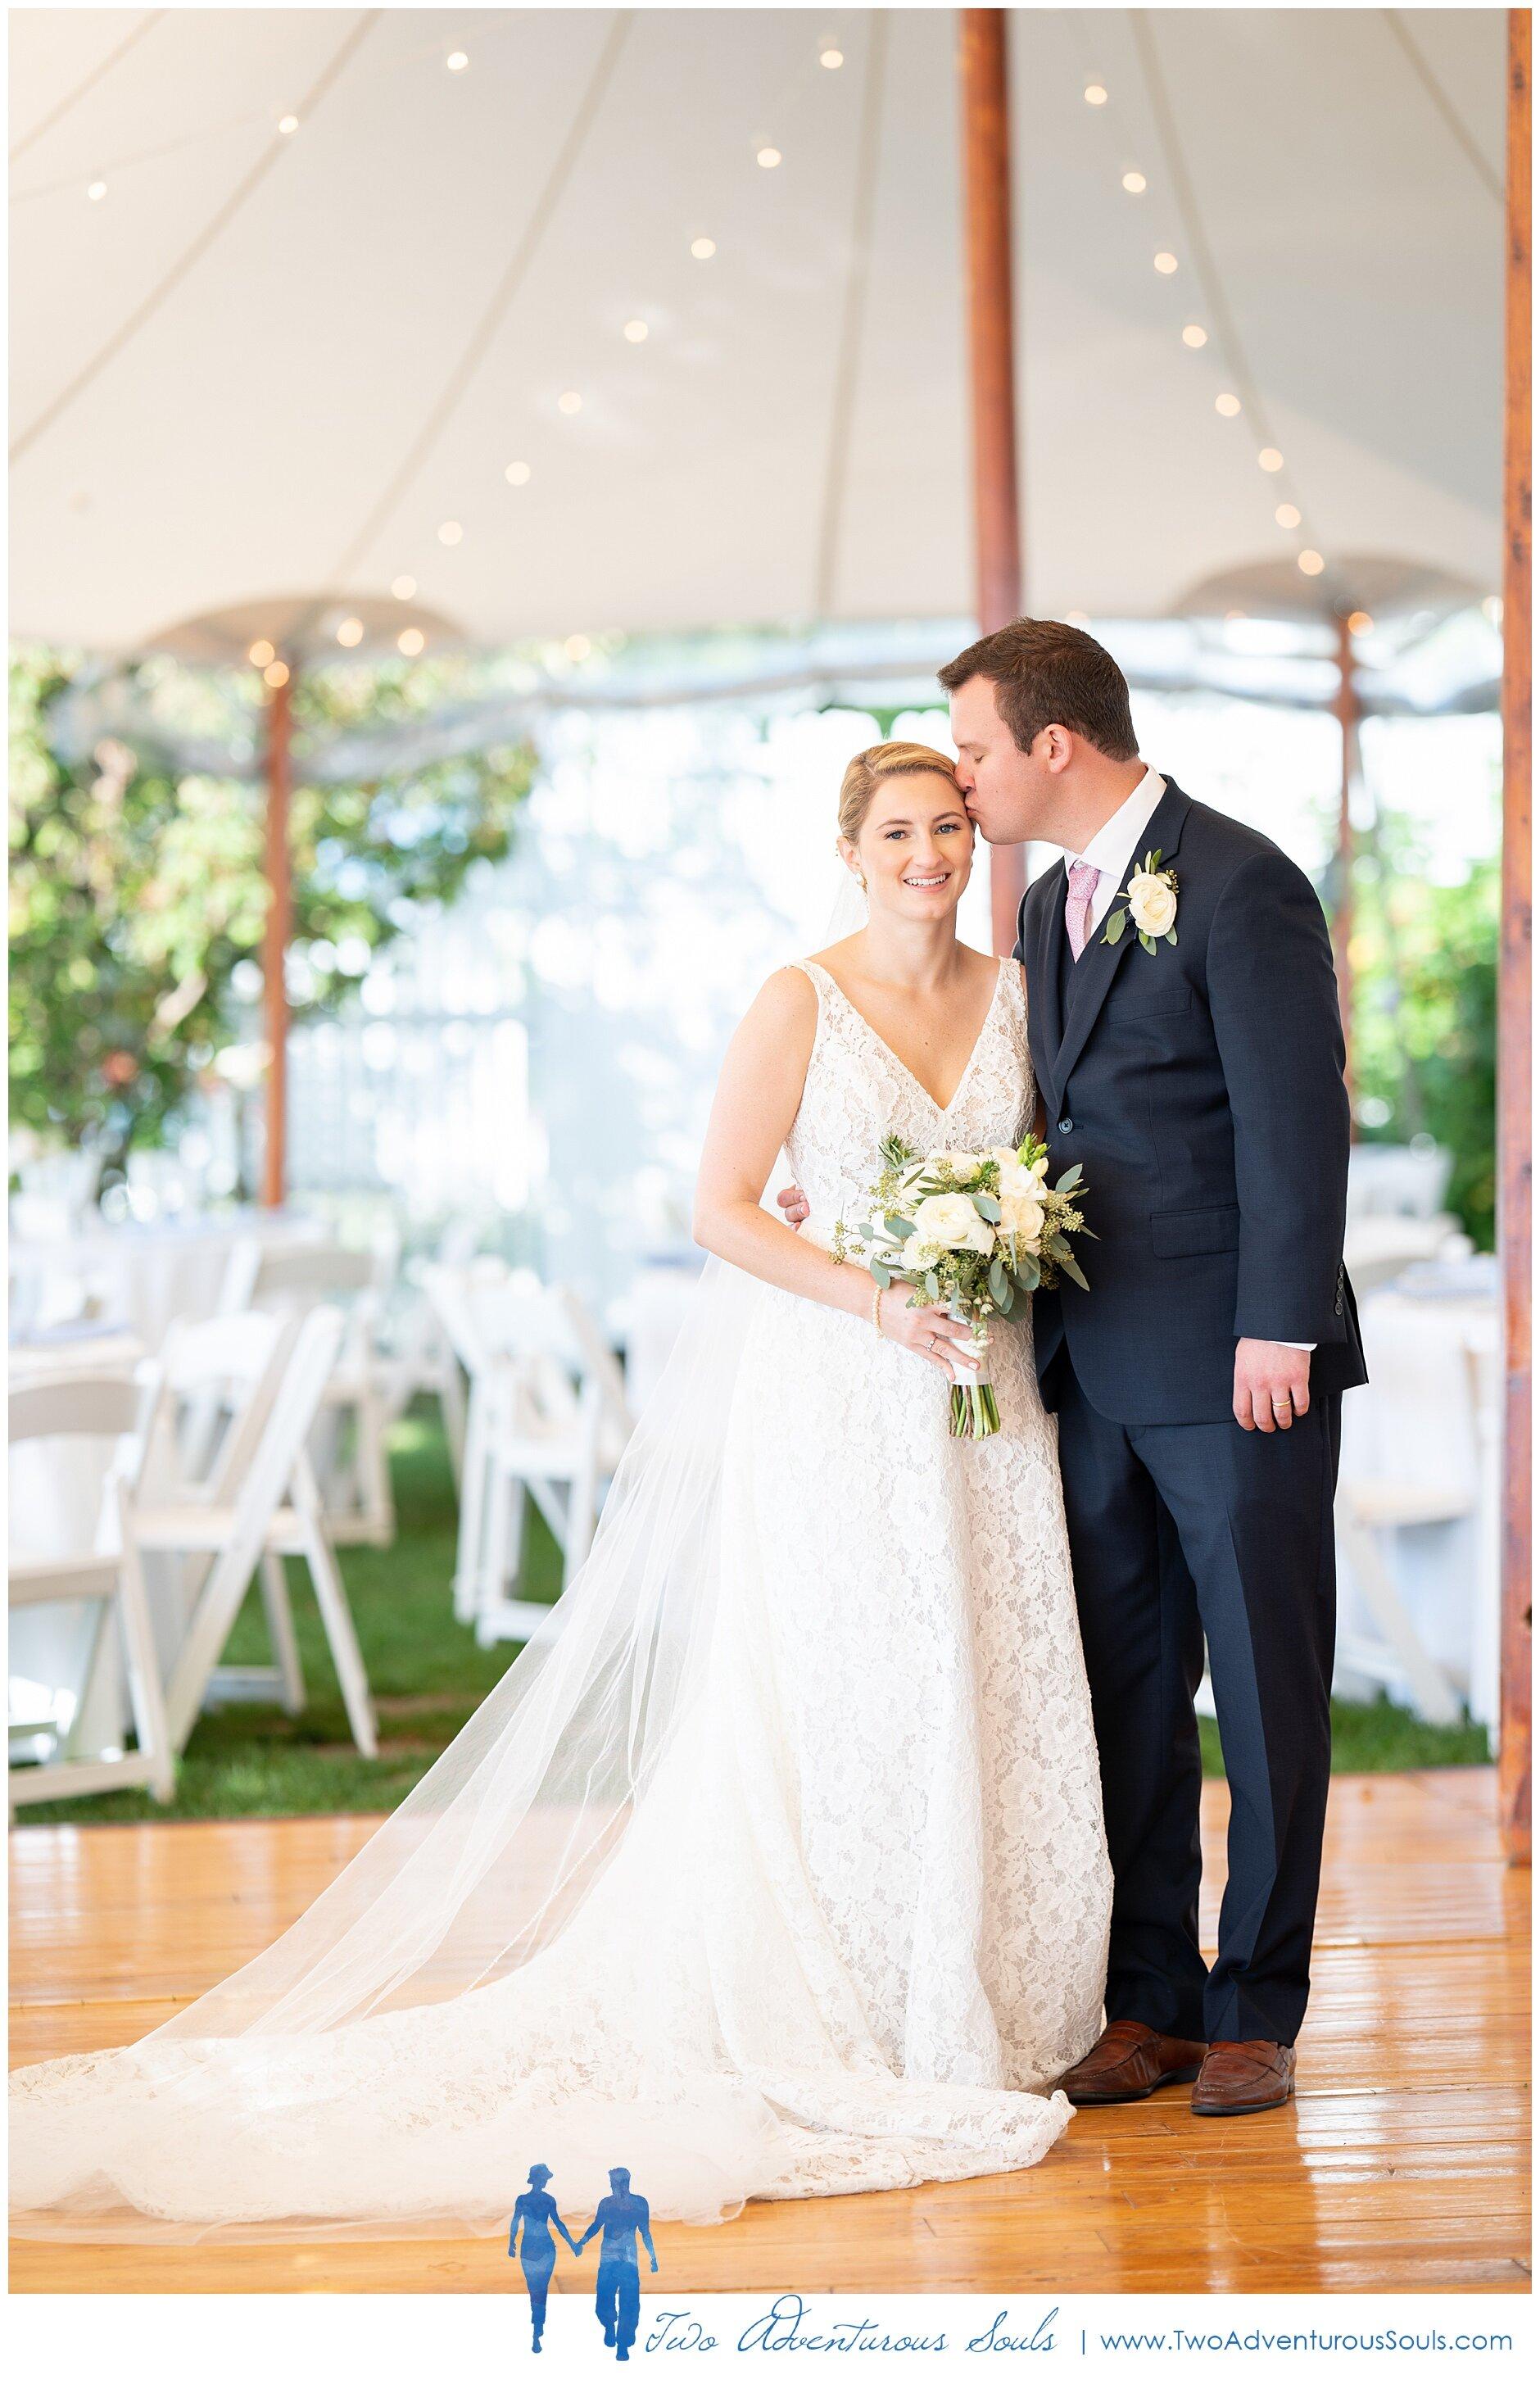 Breakwater Inn and Spa Wedding Photographers, Kennebunkport Wedding Photographers, Two Adventurous Souls- 092119_0038.jpg